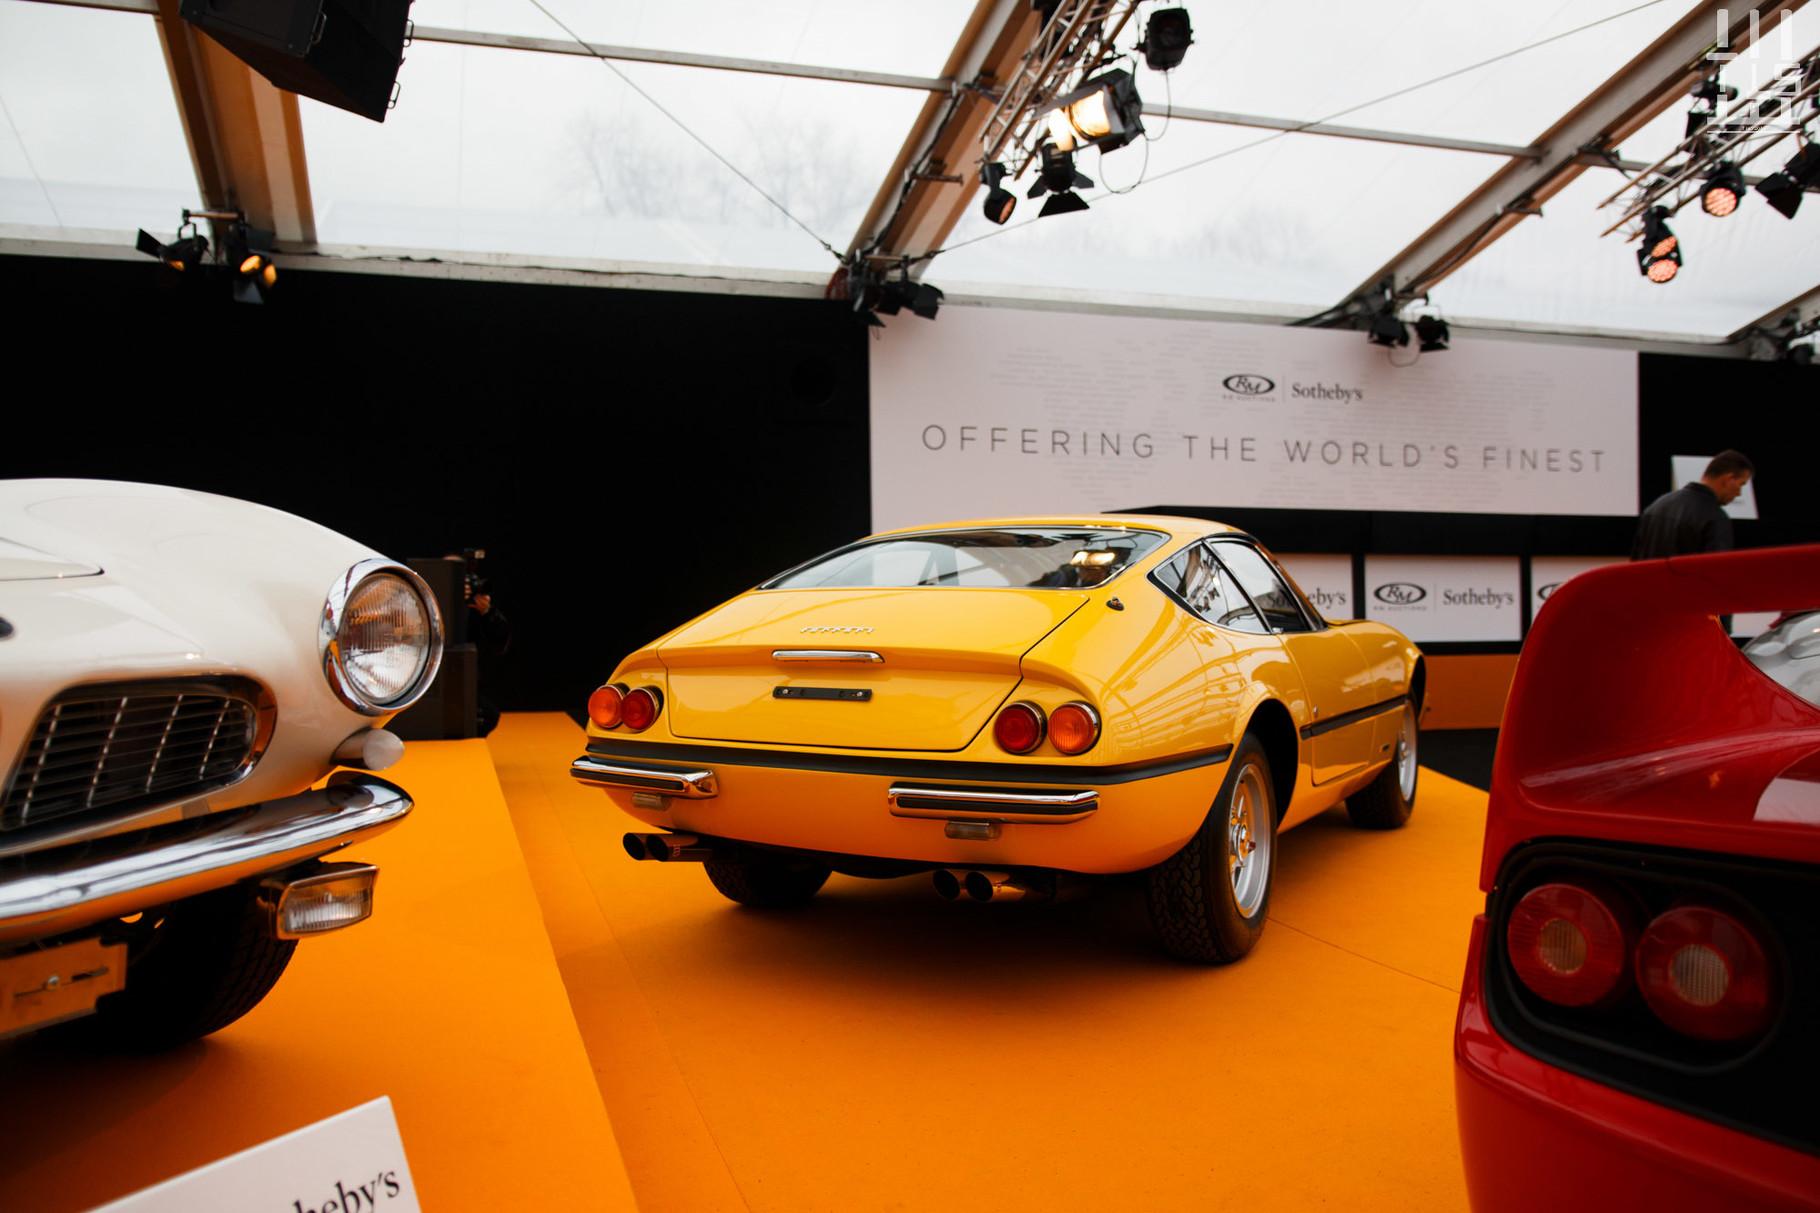 Ferrari 365 GTB/4 Daytona Plexiglas : estimée entre 700 000 et 900 000 euros, invendue.